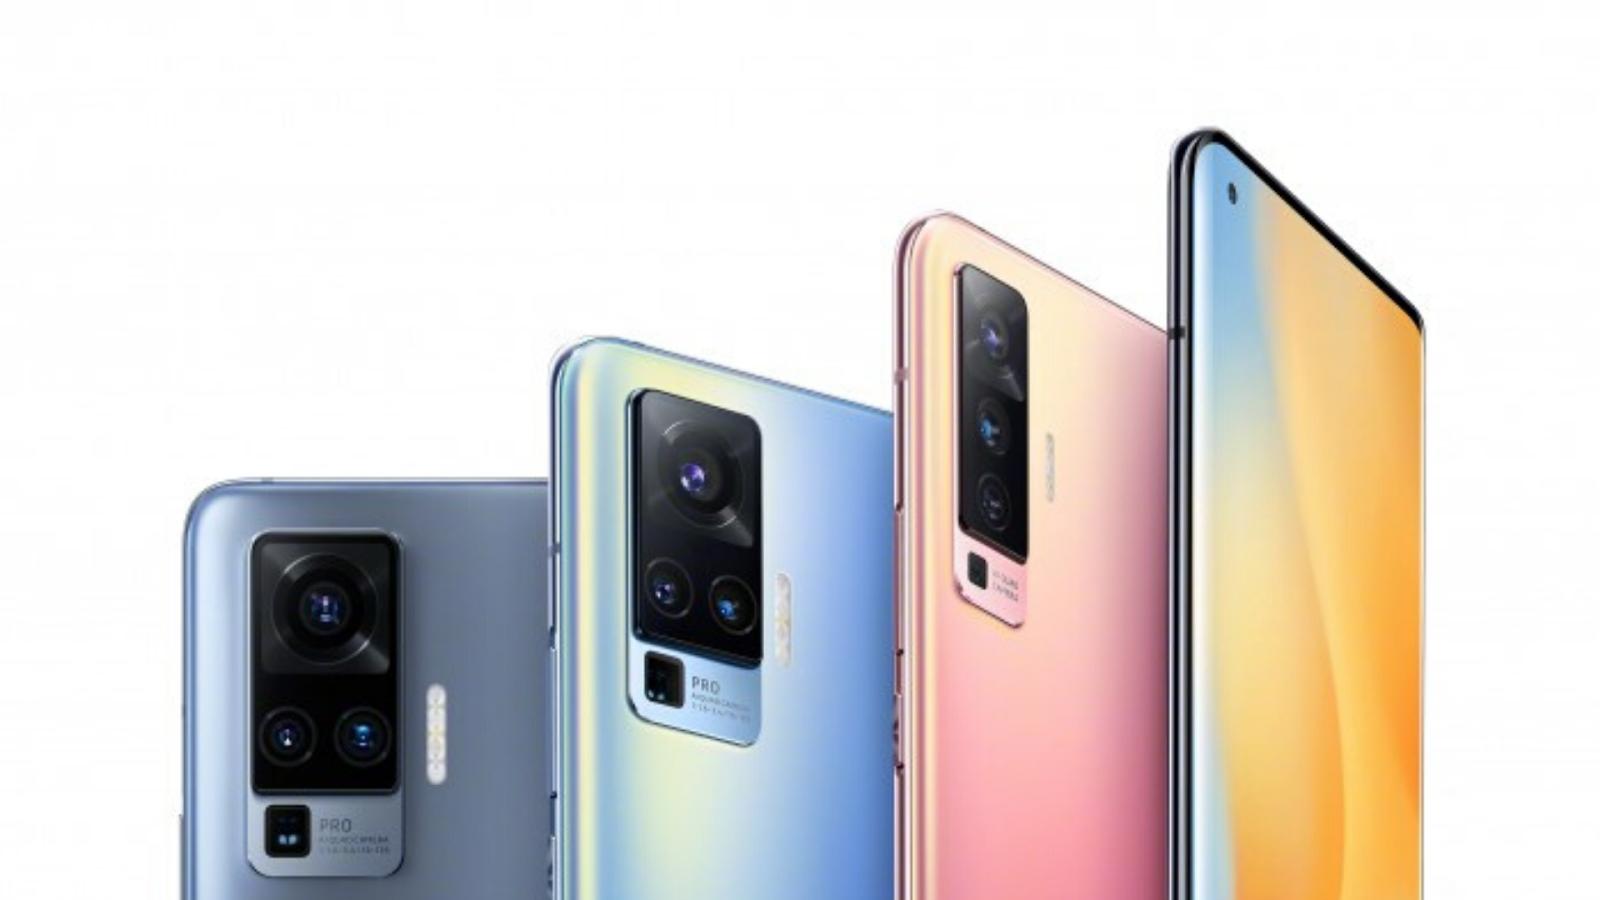 Vivo Lancarkan 3 Smartphone Terbaru Dibawah Siri X - Oh! Media